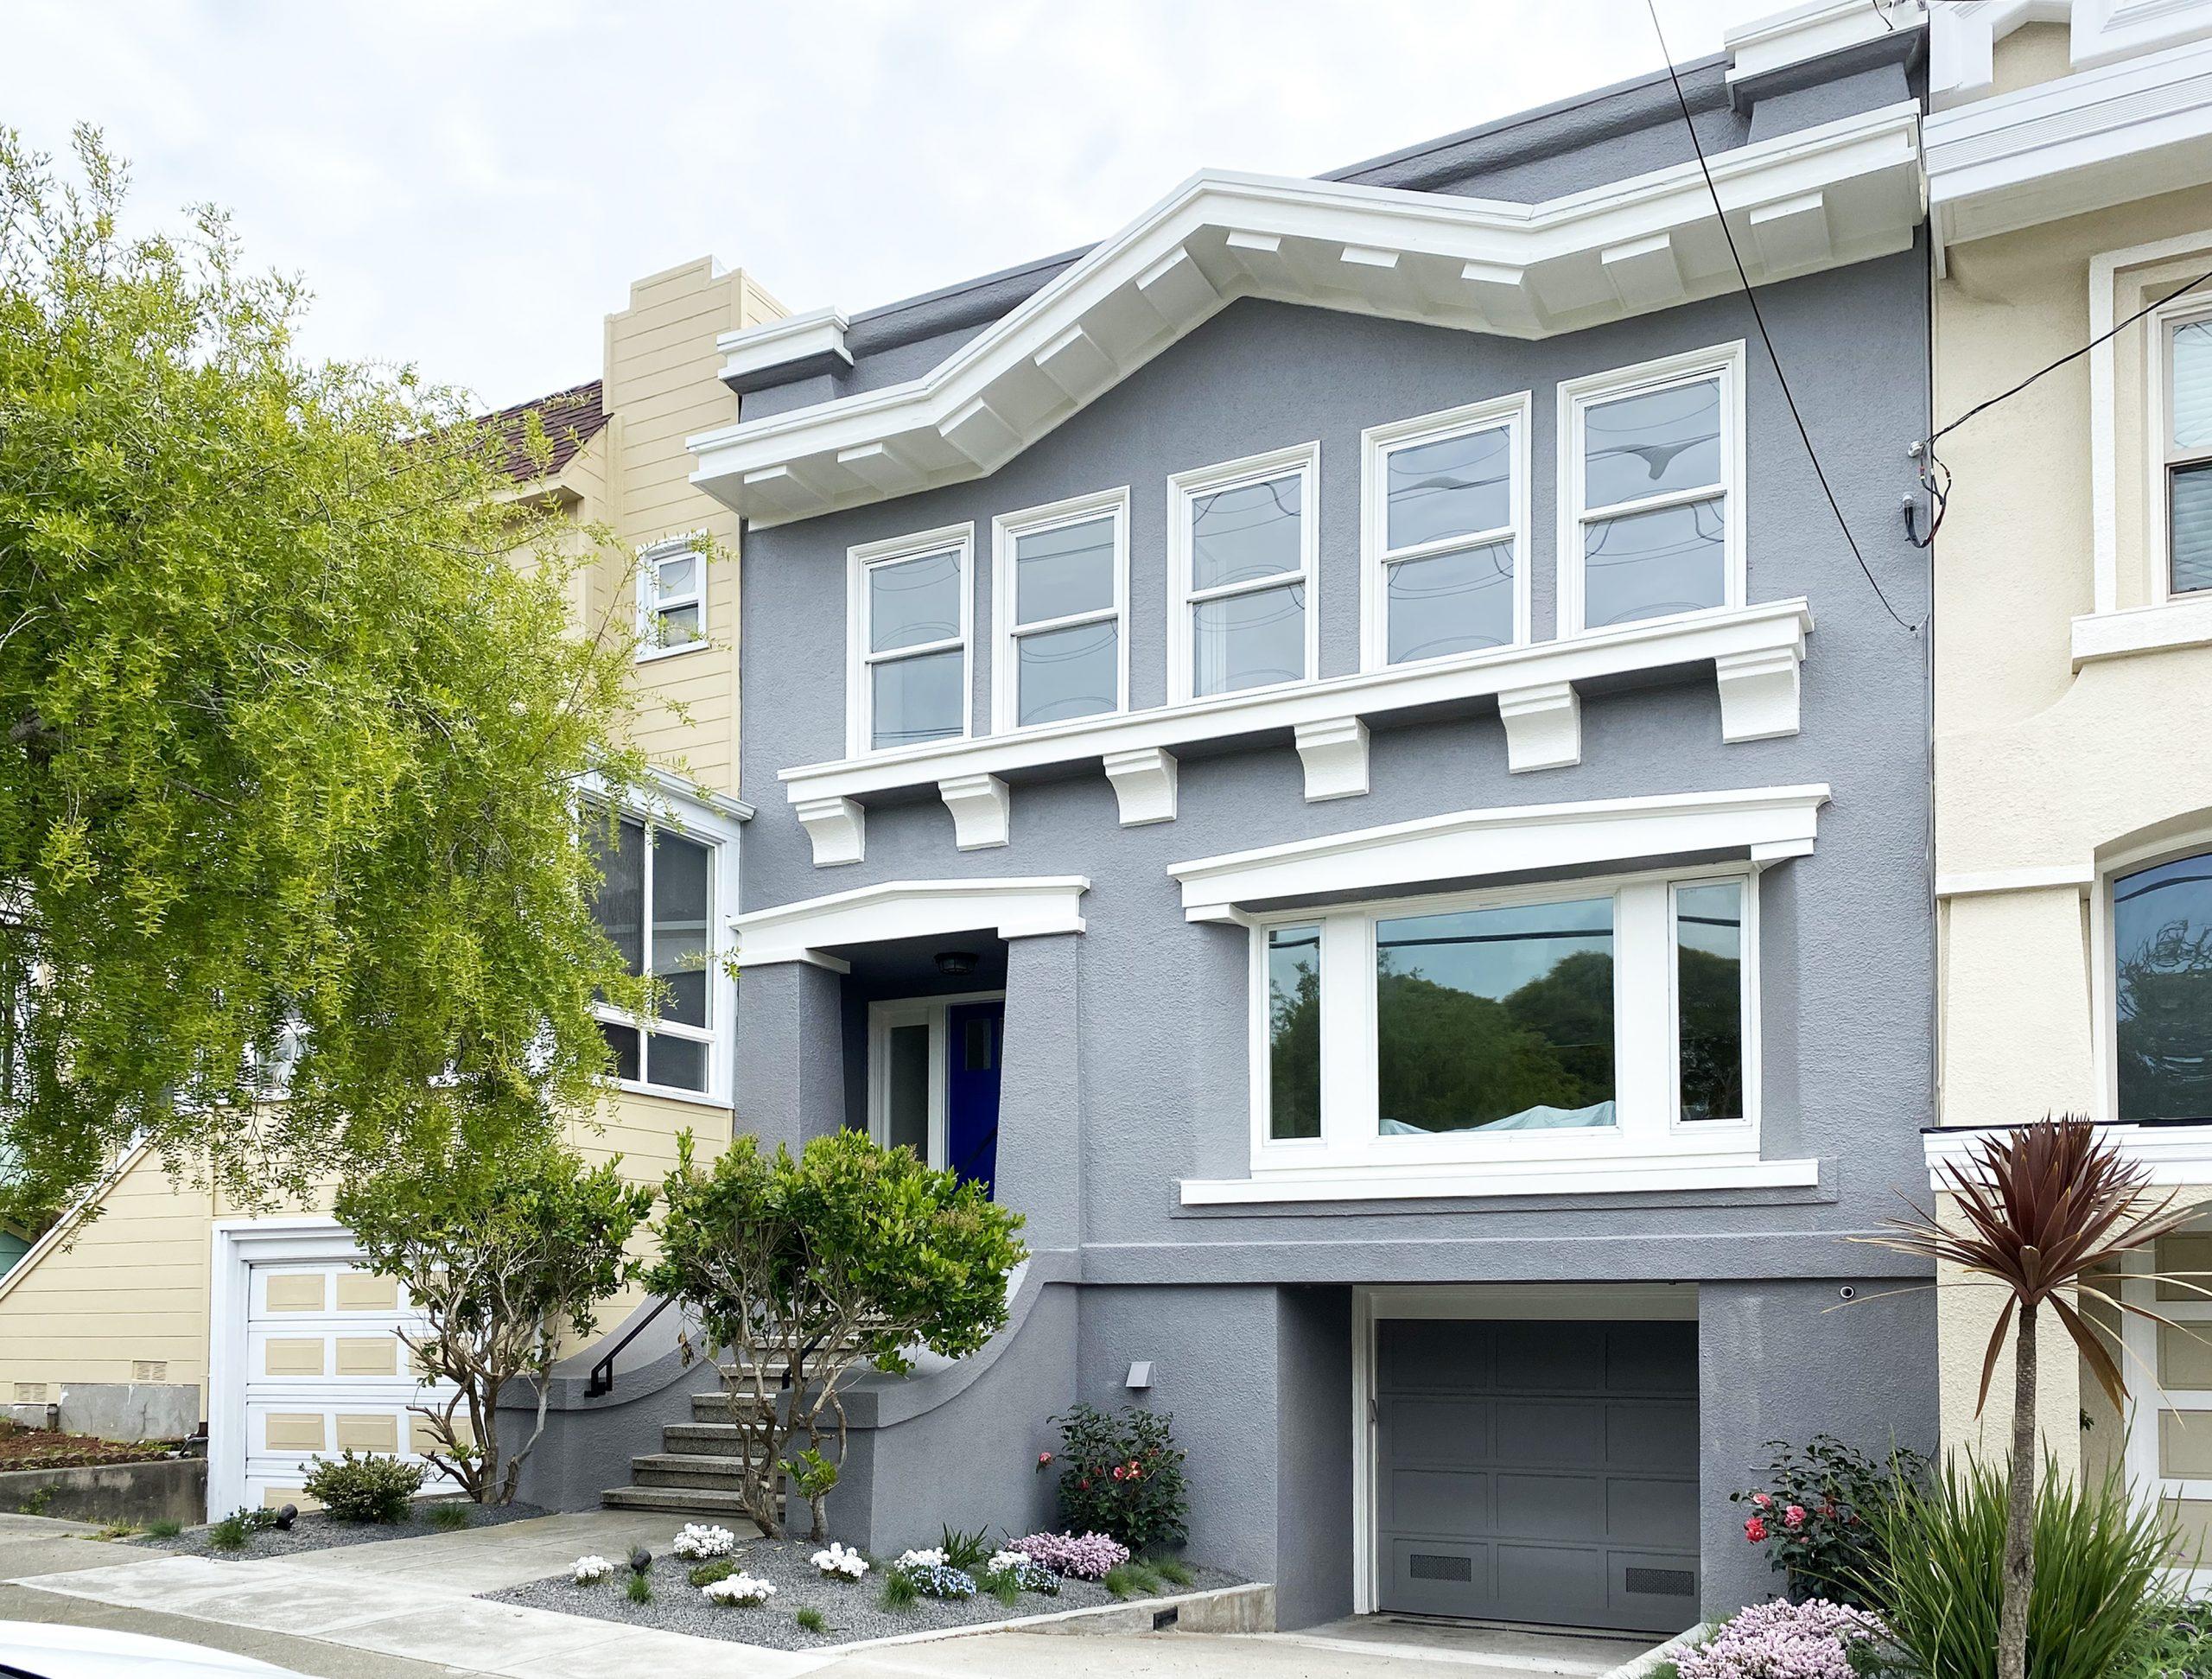 752 24th Avenue   - San Francisco, CA